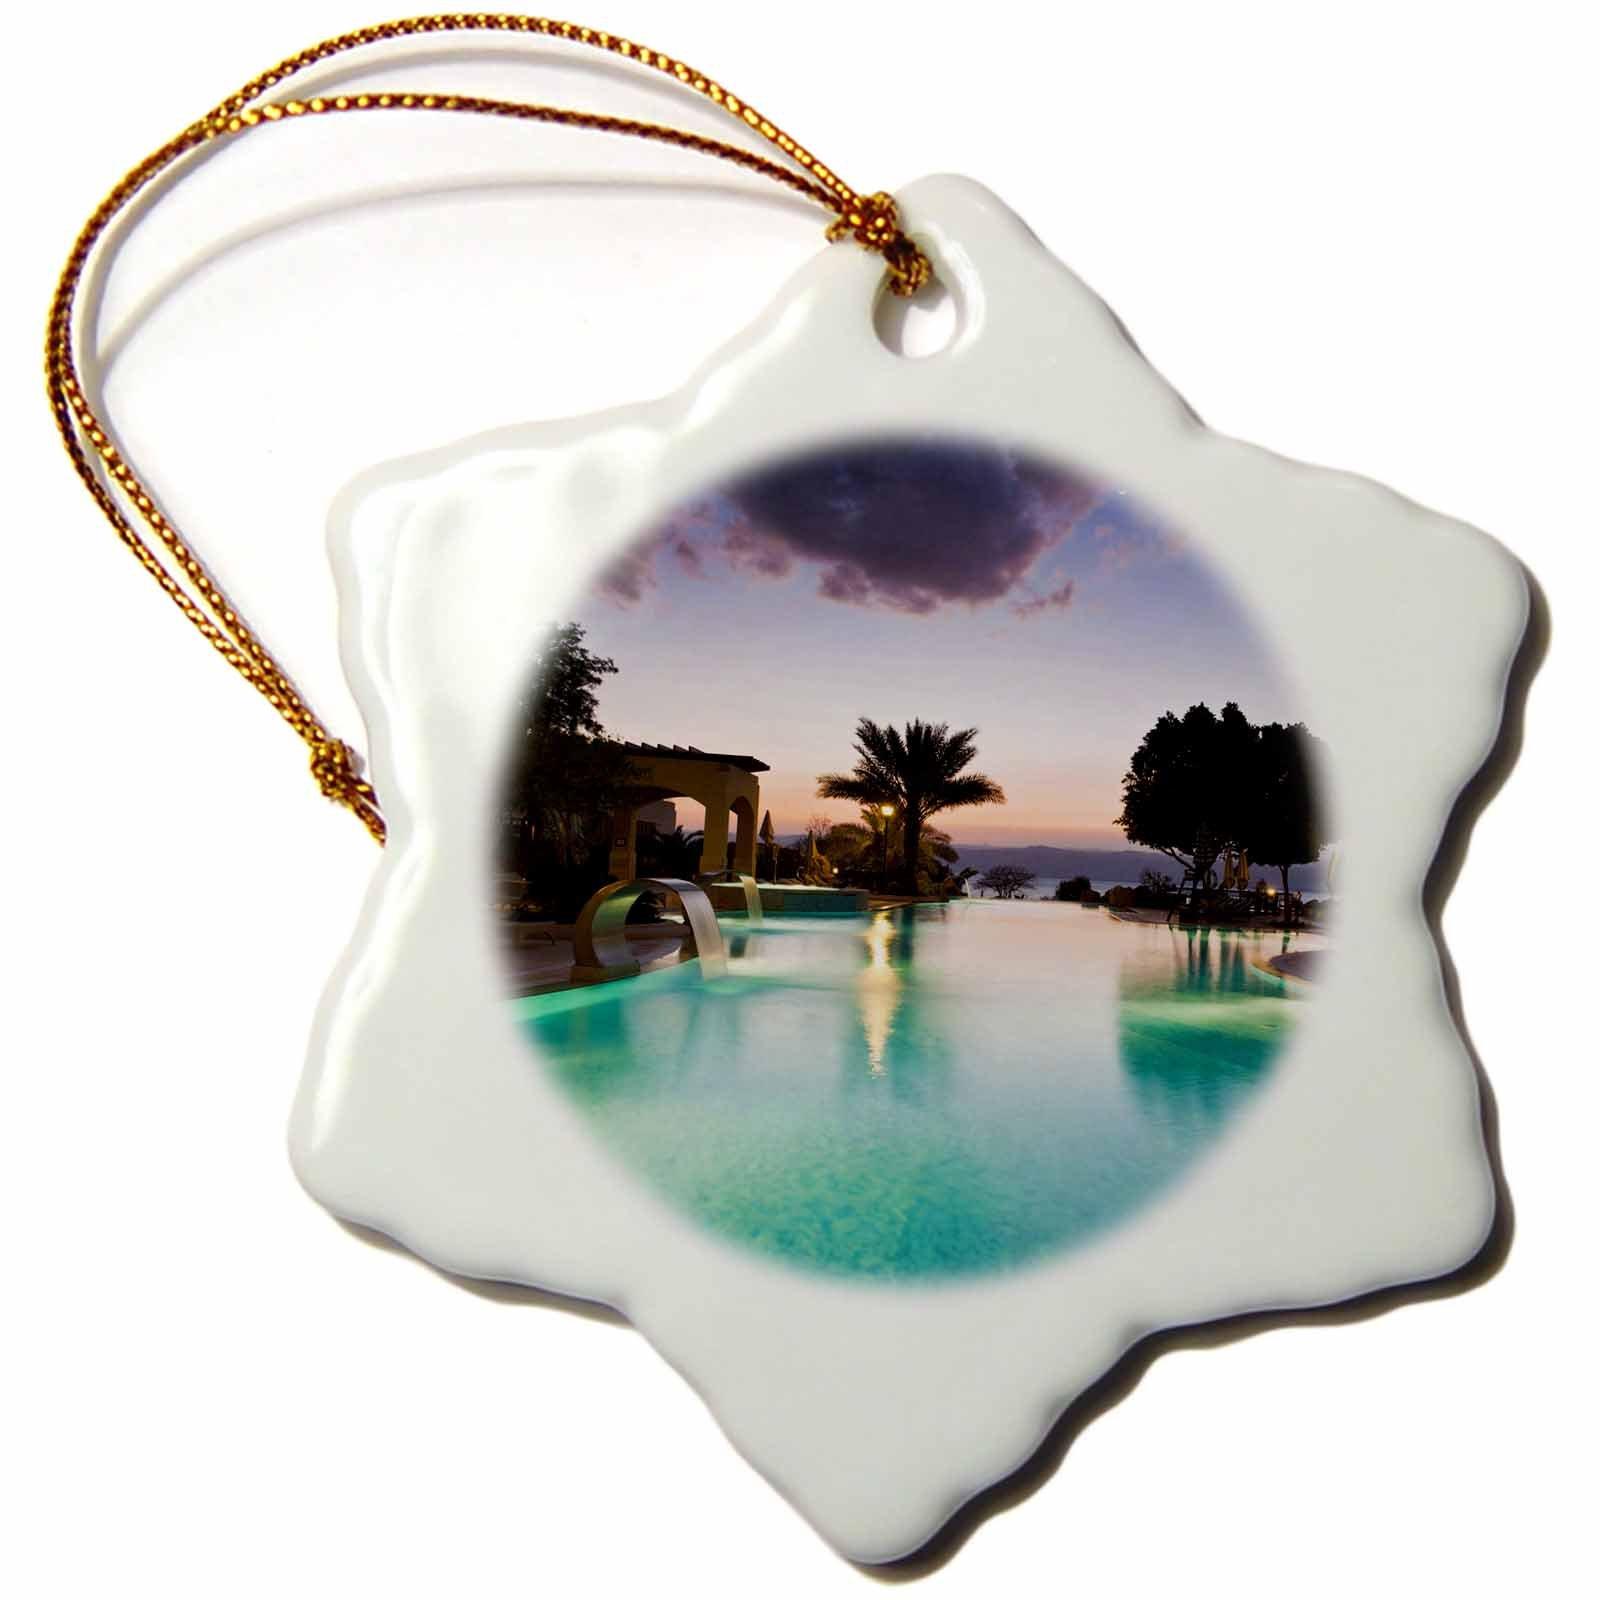 3dRose orn_72644_1 Jordan, Dead Sea, Suweimah, Pool, Marriott Hotel-AS16 WBI0174-Walter Bibikow-Snowflake Ornament, Porcelain, 3''